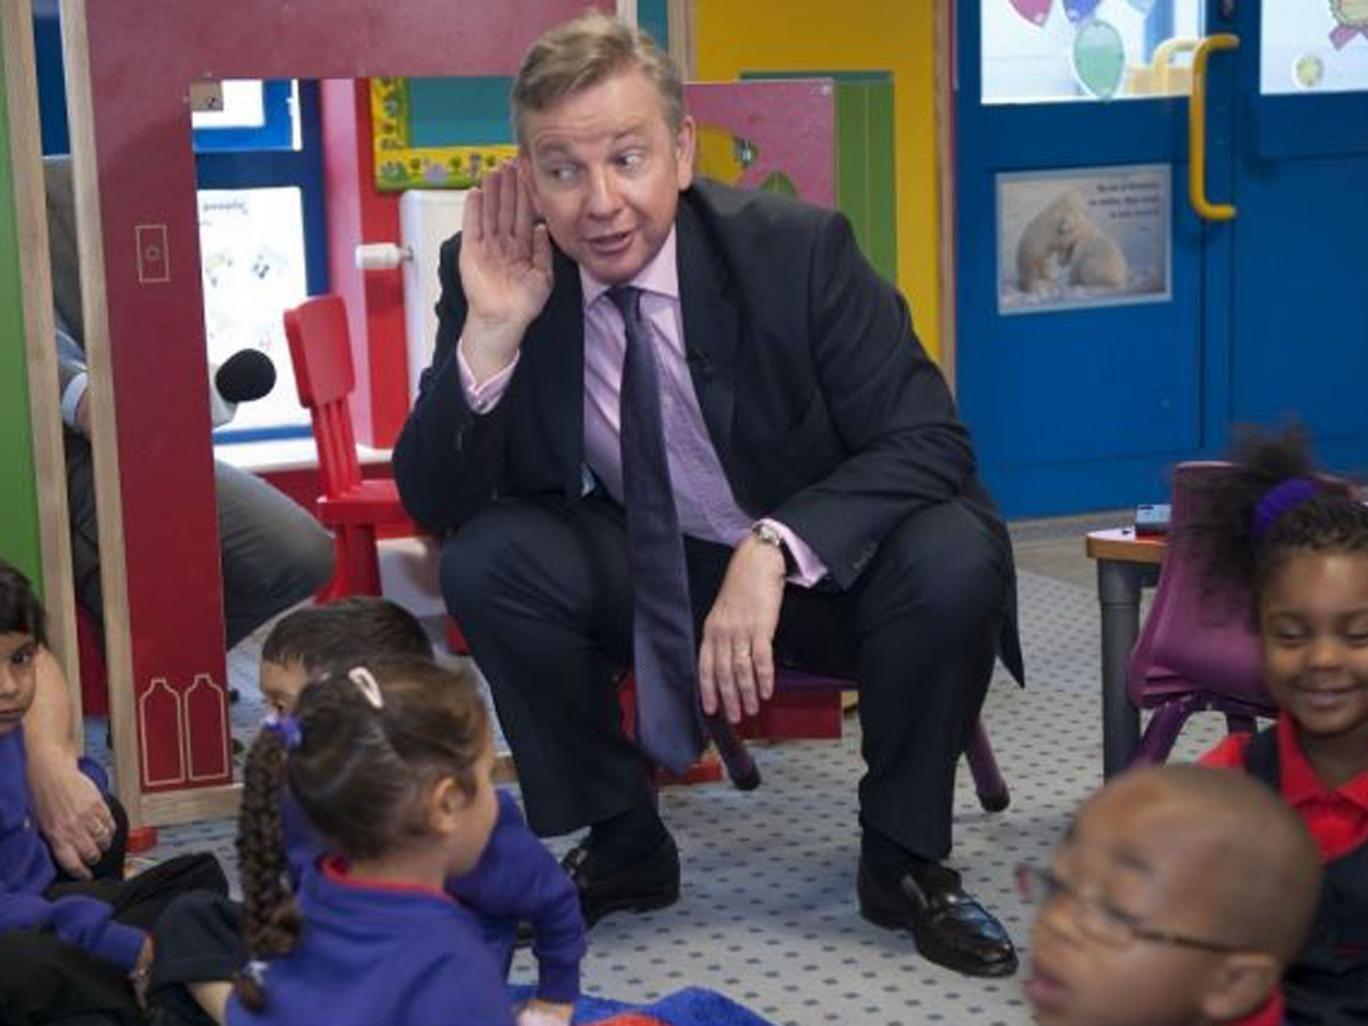 Education Secretary Michael Gove visits a school